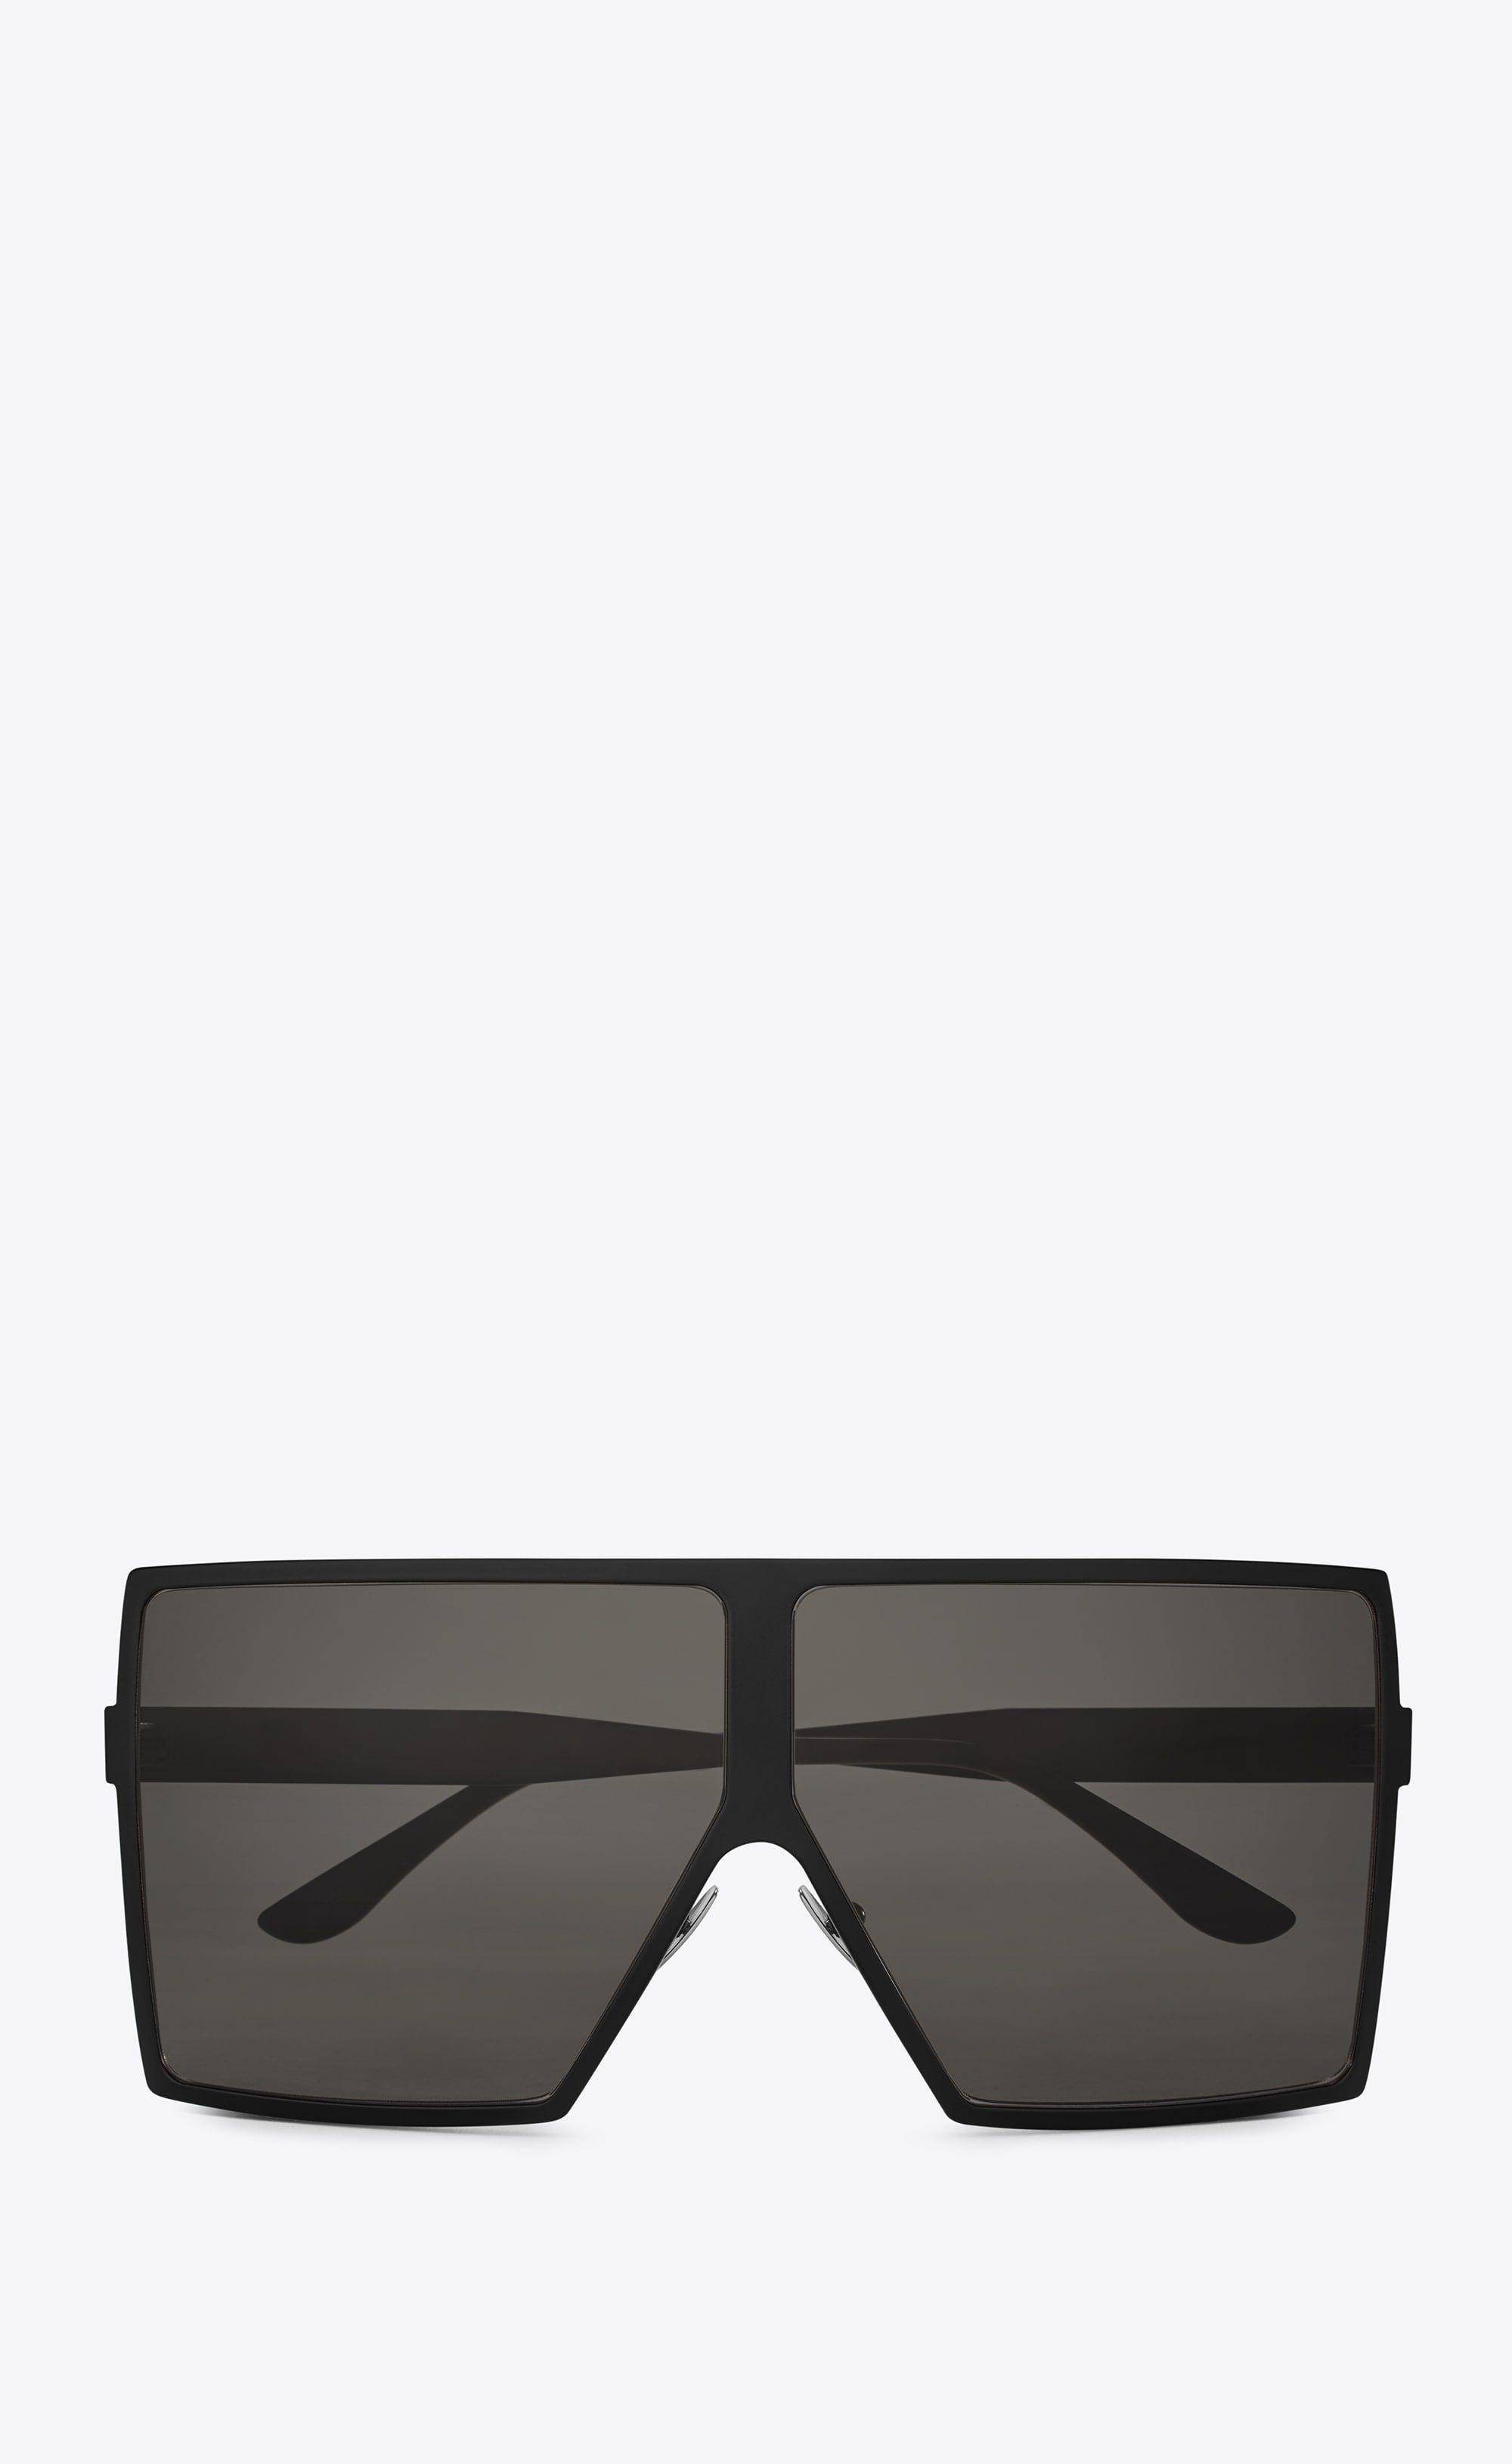 Saint Laurent New Wave 182 Betty Sunglasses In Matte